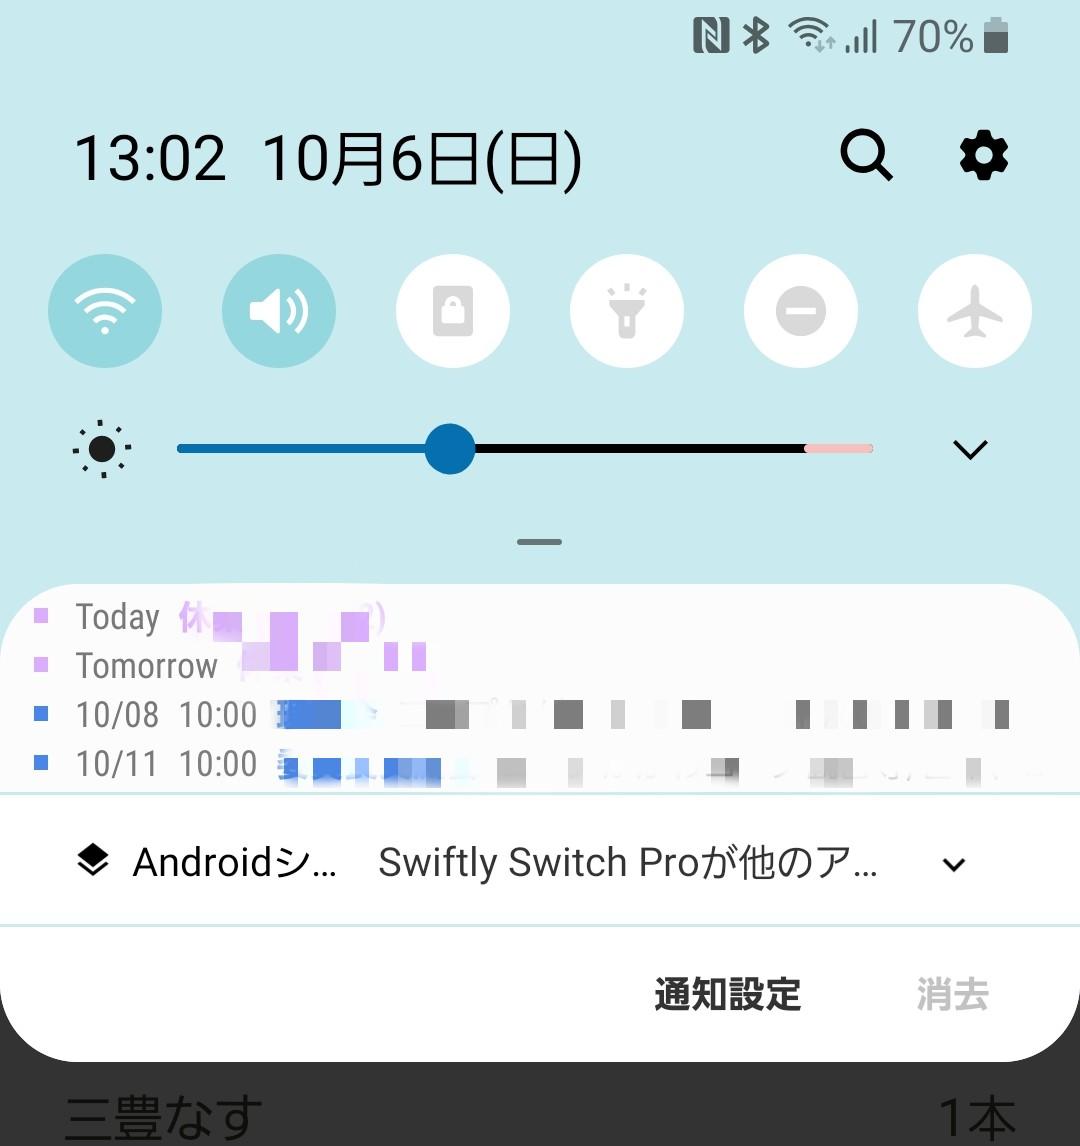 202105201301241-admin.jpg